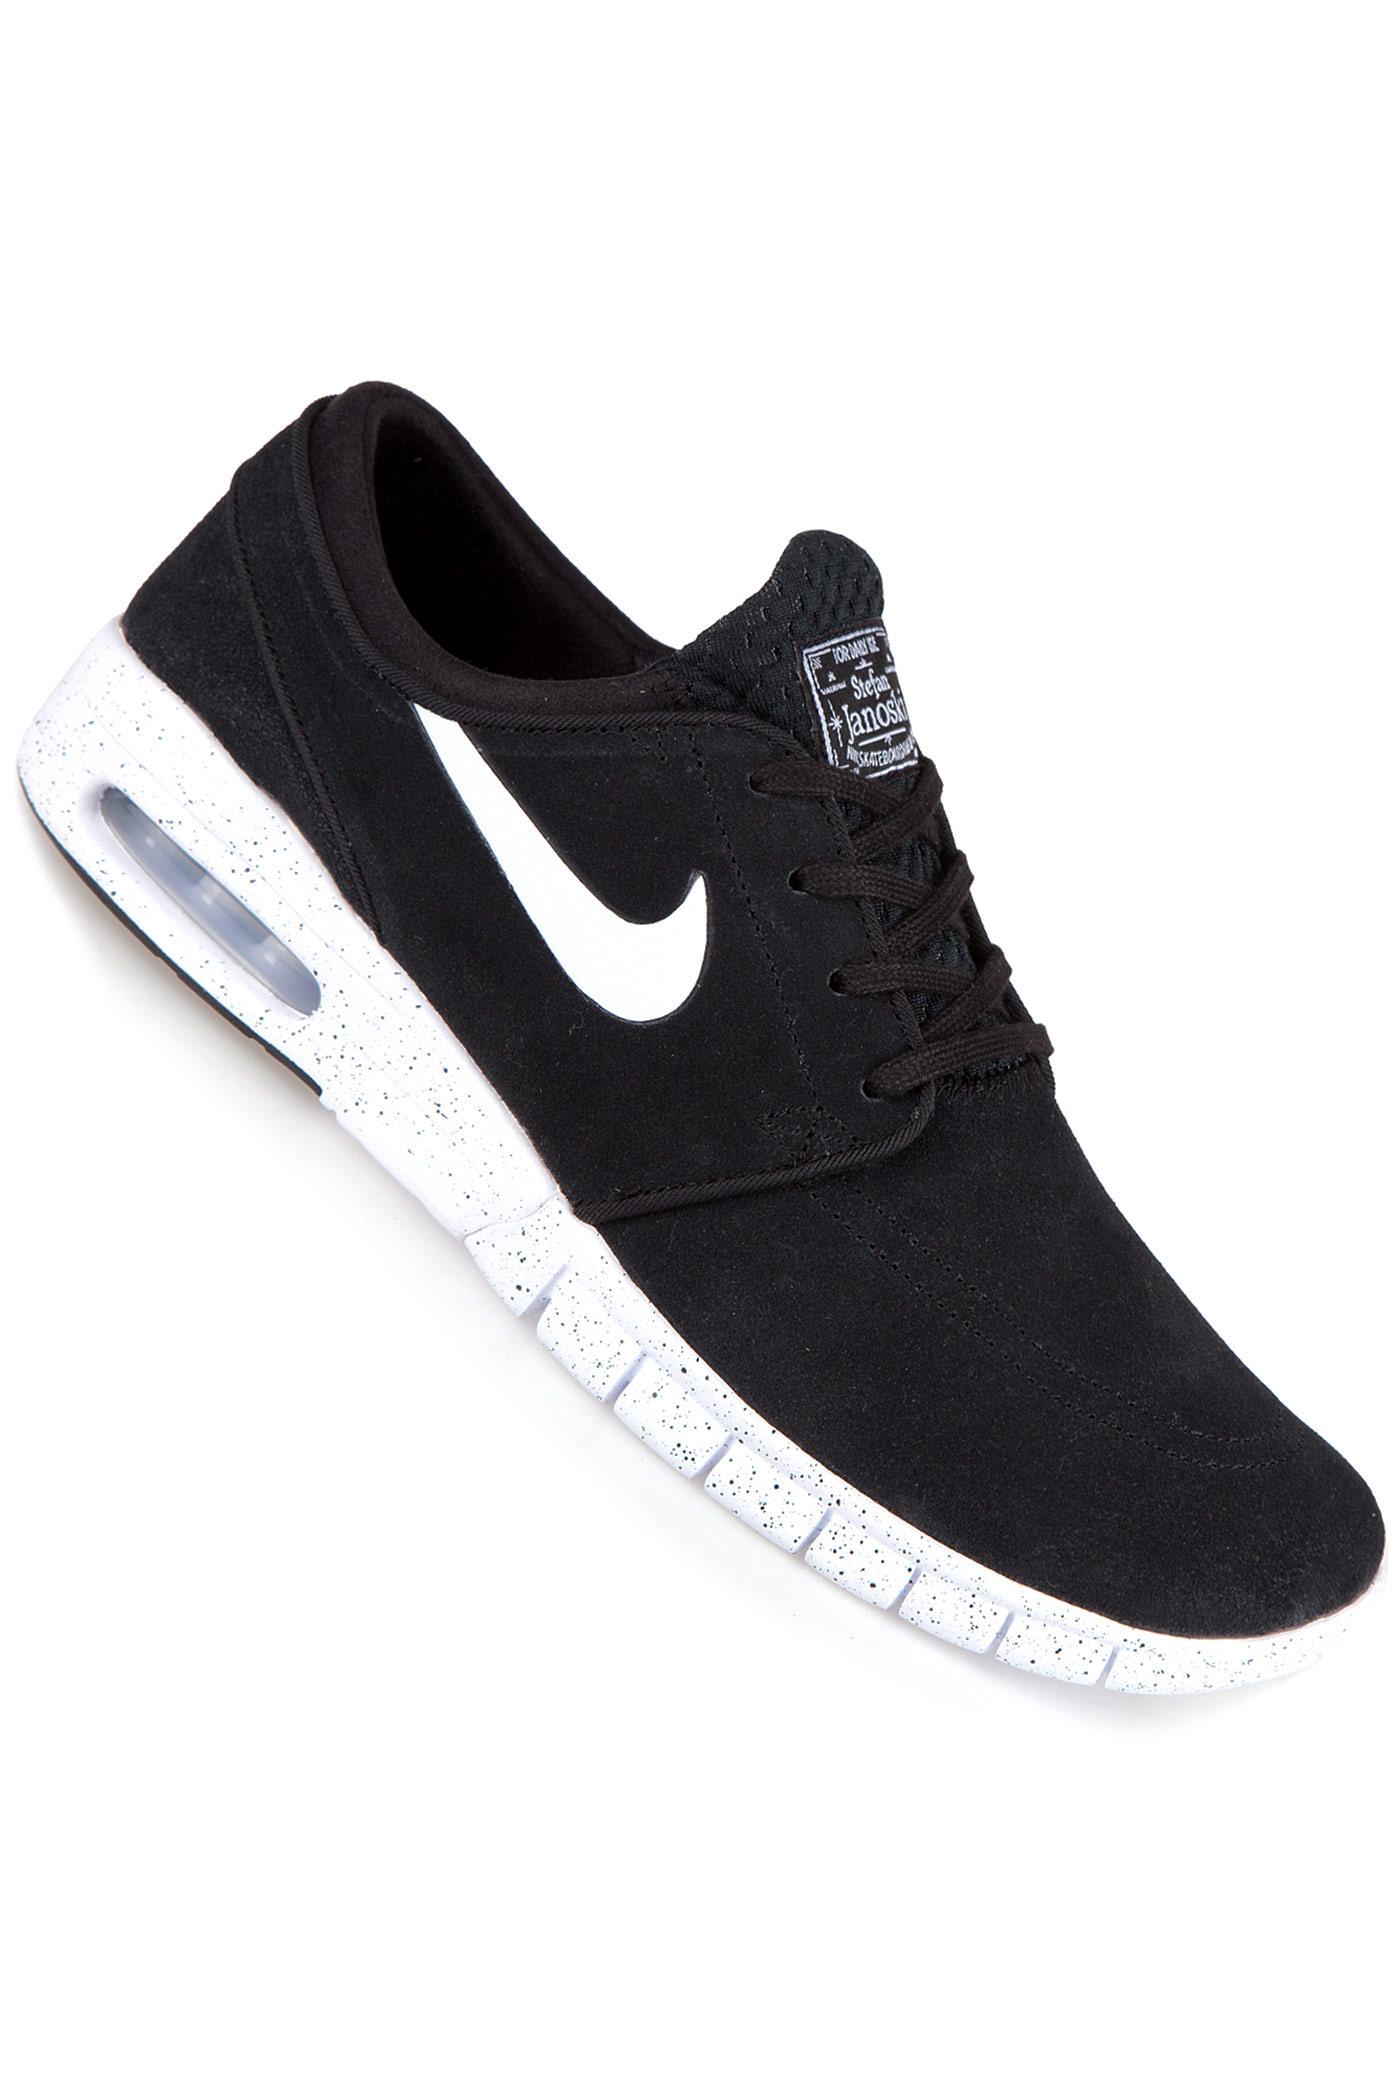 nike sb stefan janoski max suede chaussure black white achetez sur skatedeluxe. Black Bedroom Furniture Sets. Home Design Ideas